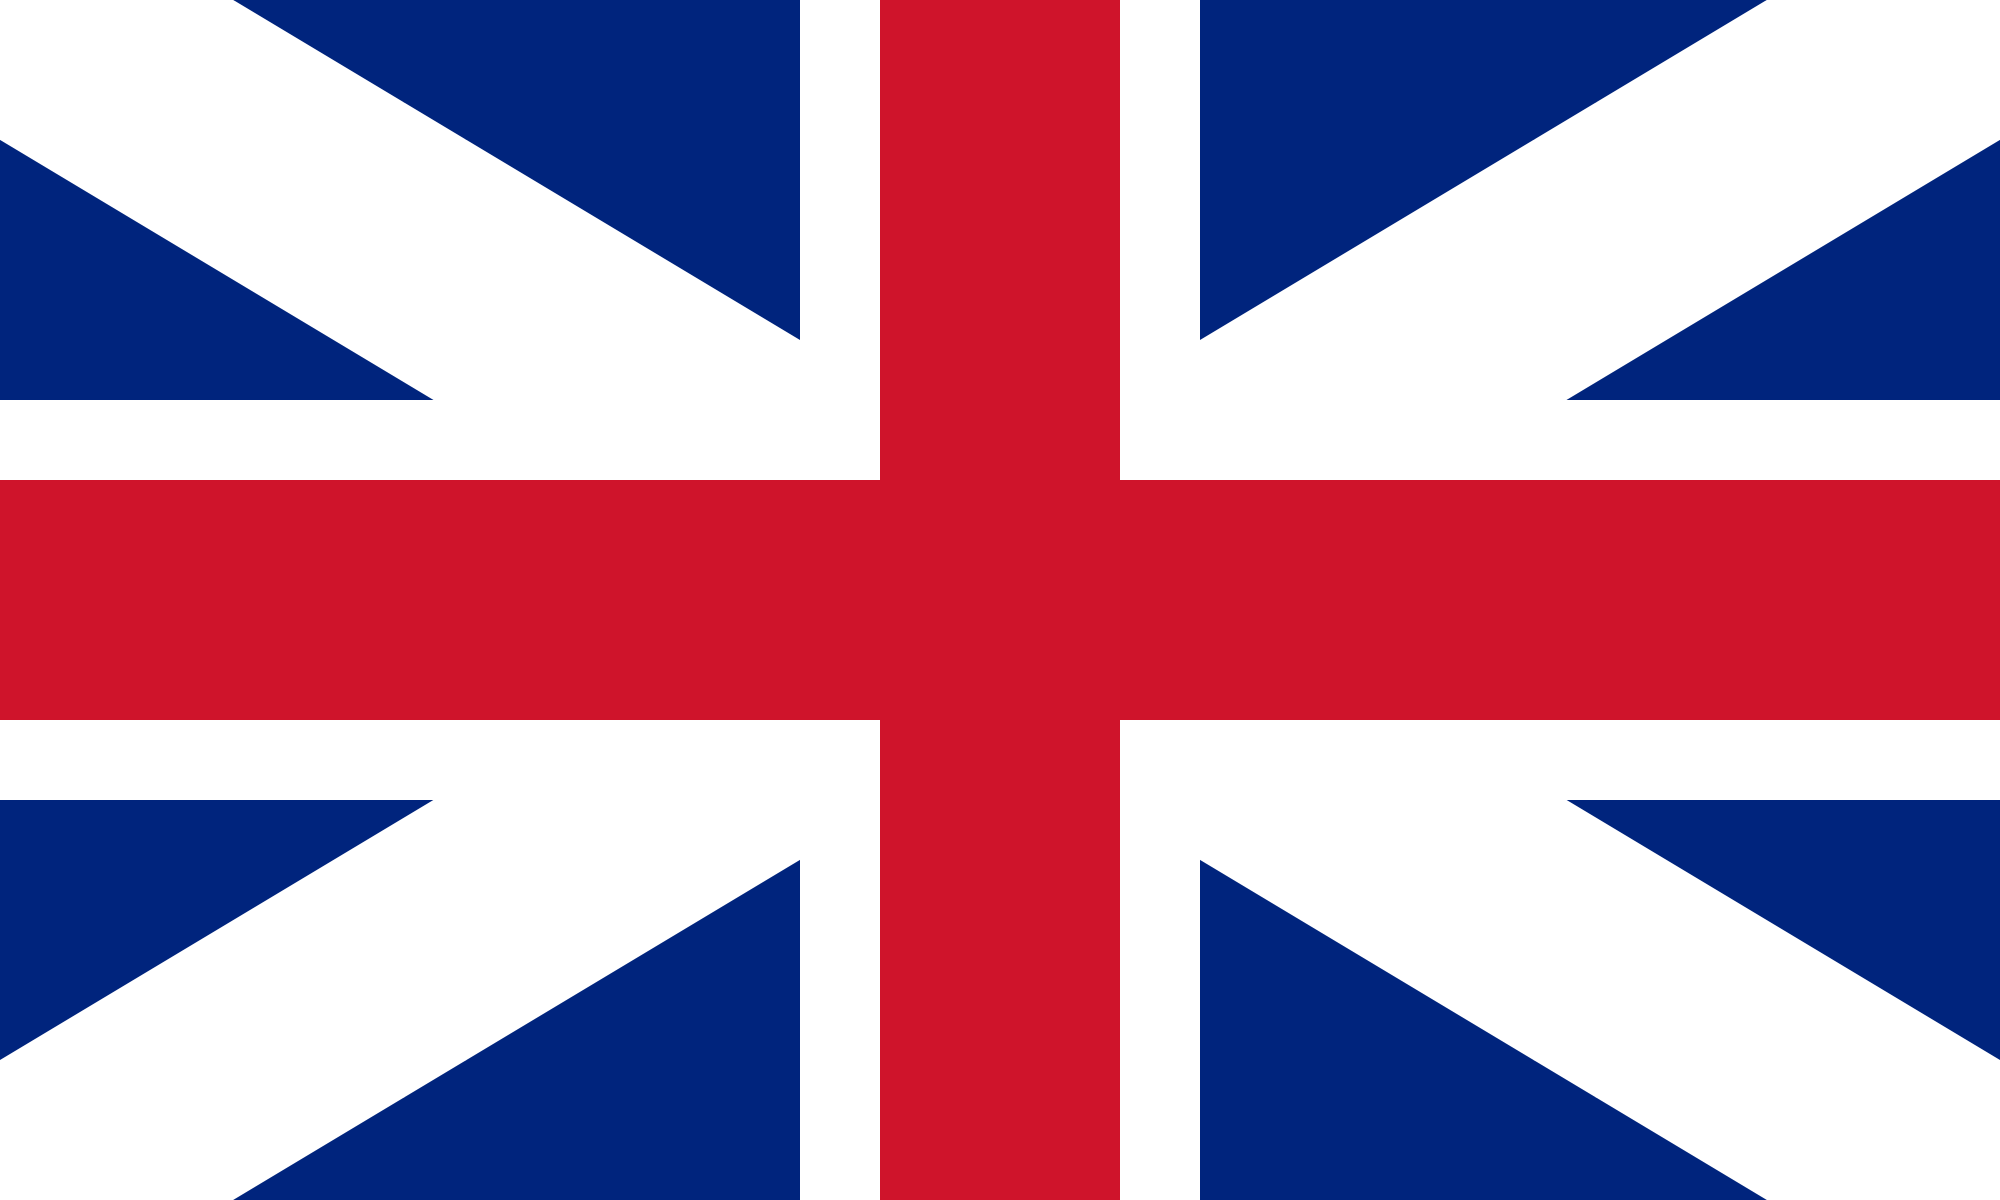 British Flag Backgrounds 2000x1200